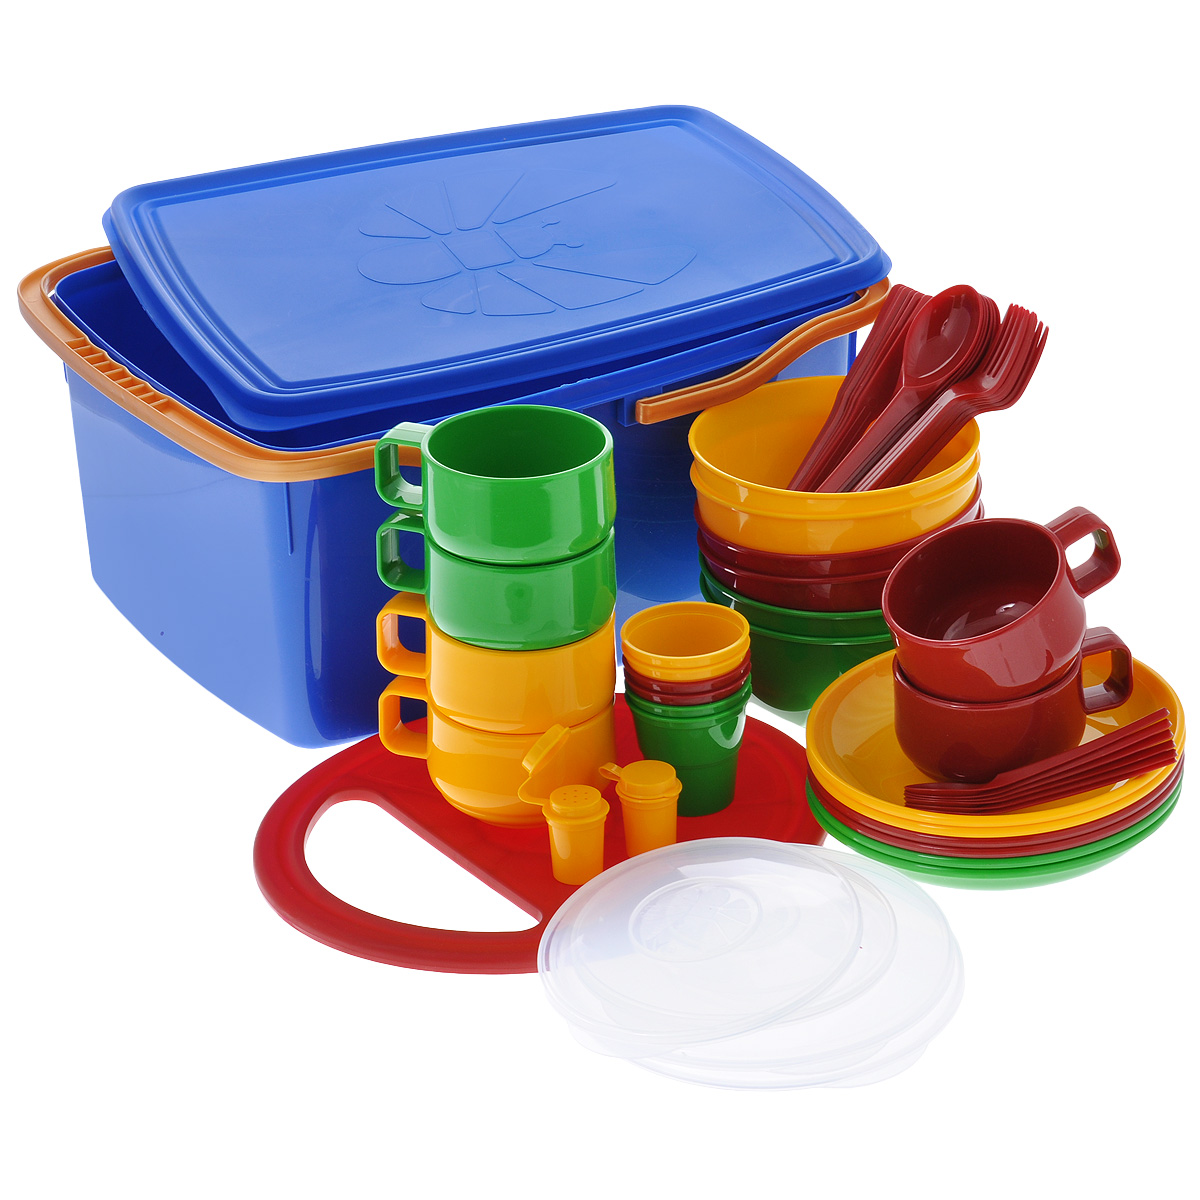 Набор посуды Solaris, в контейнере, на 6 персон виброплита vektor vpg 50b lifan л с 2 6 kh 12 40 см сек